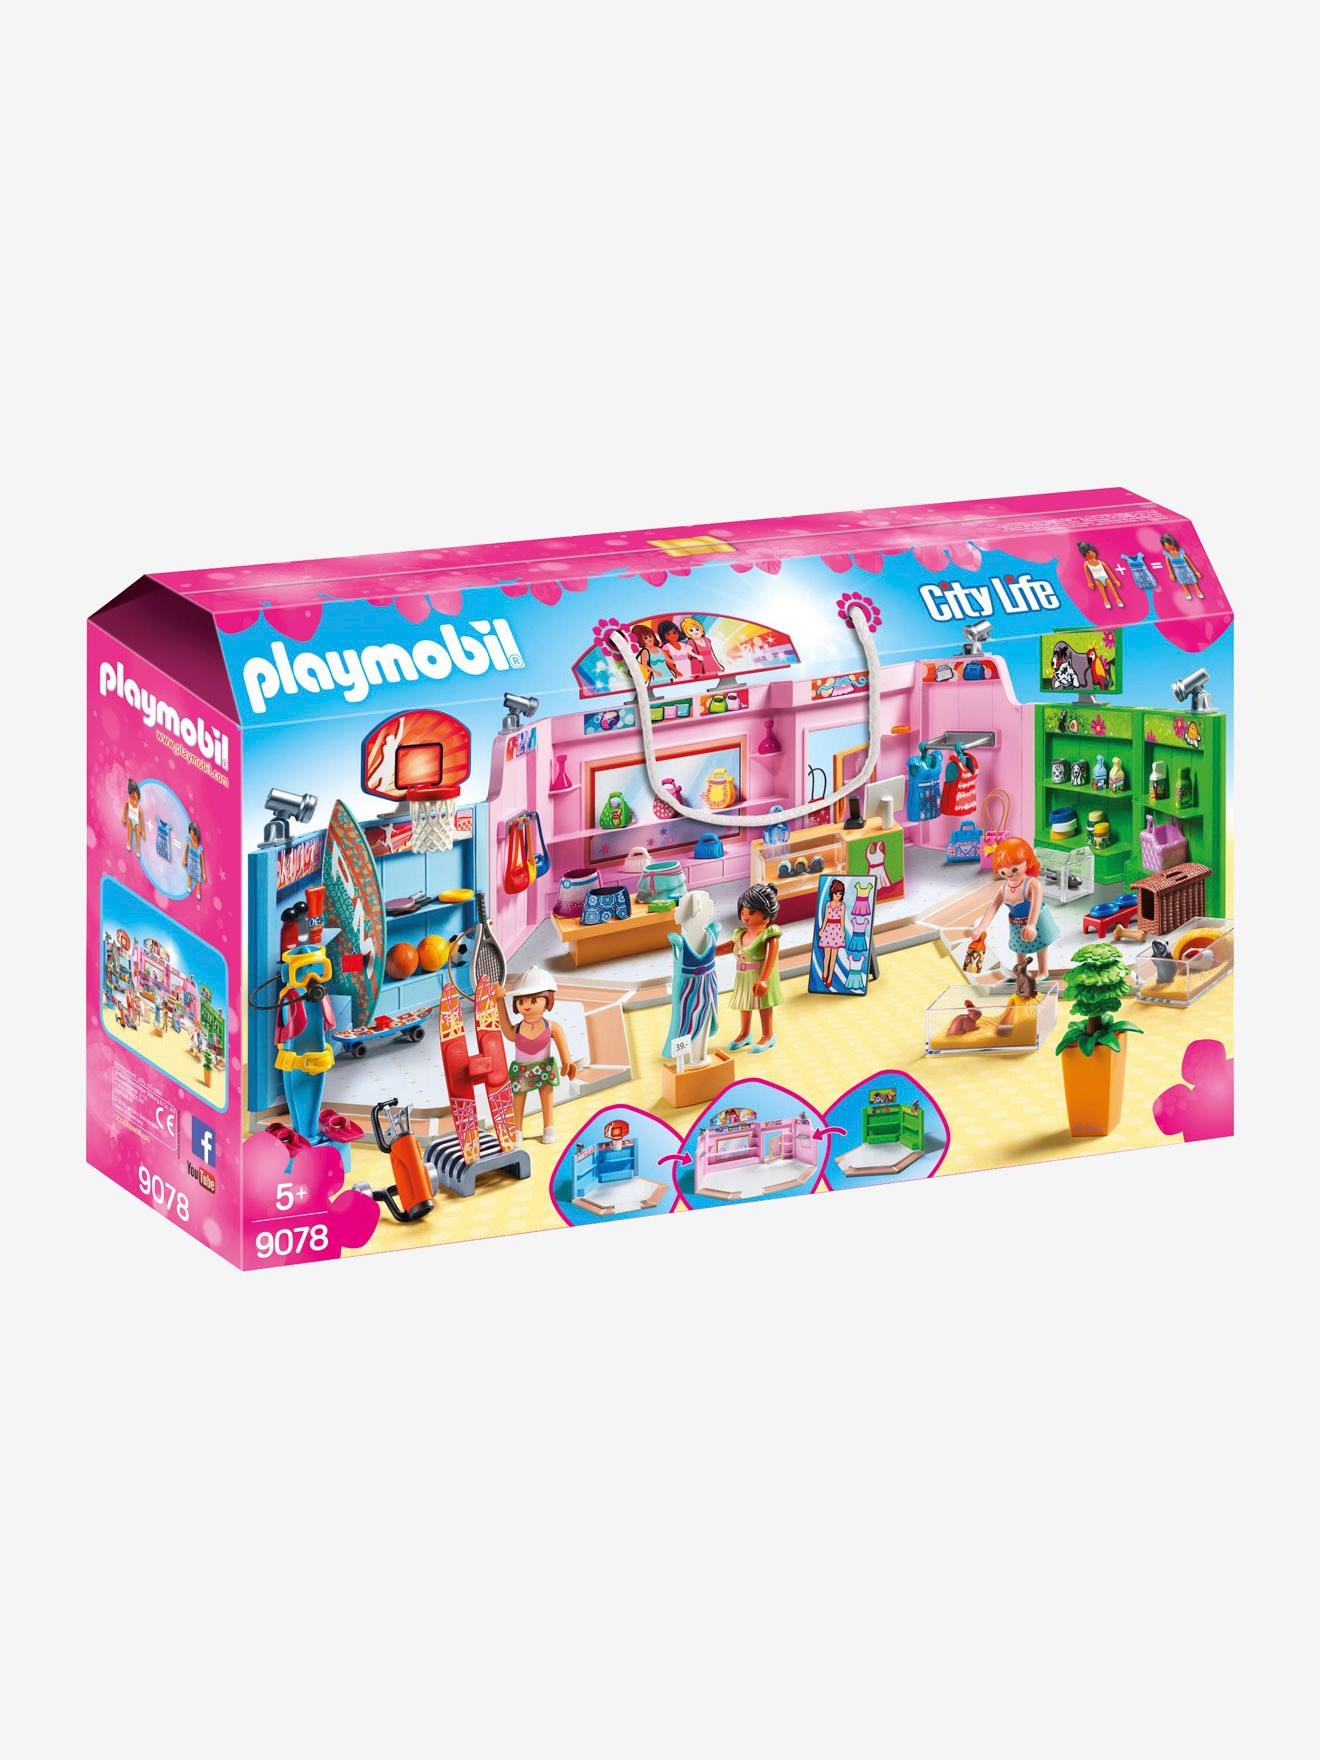 Playmobil Petit Boite De Chambre Onestopcolorado